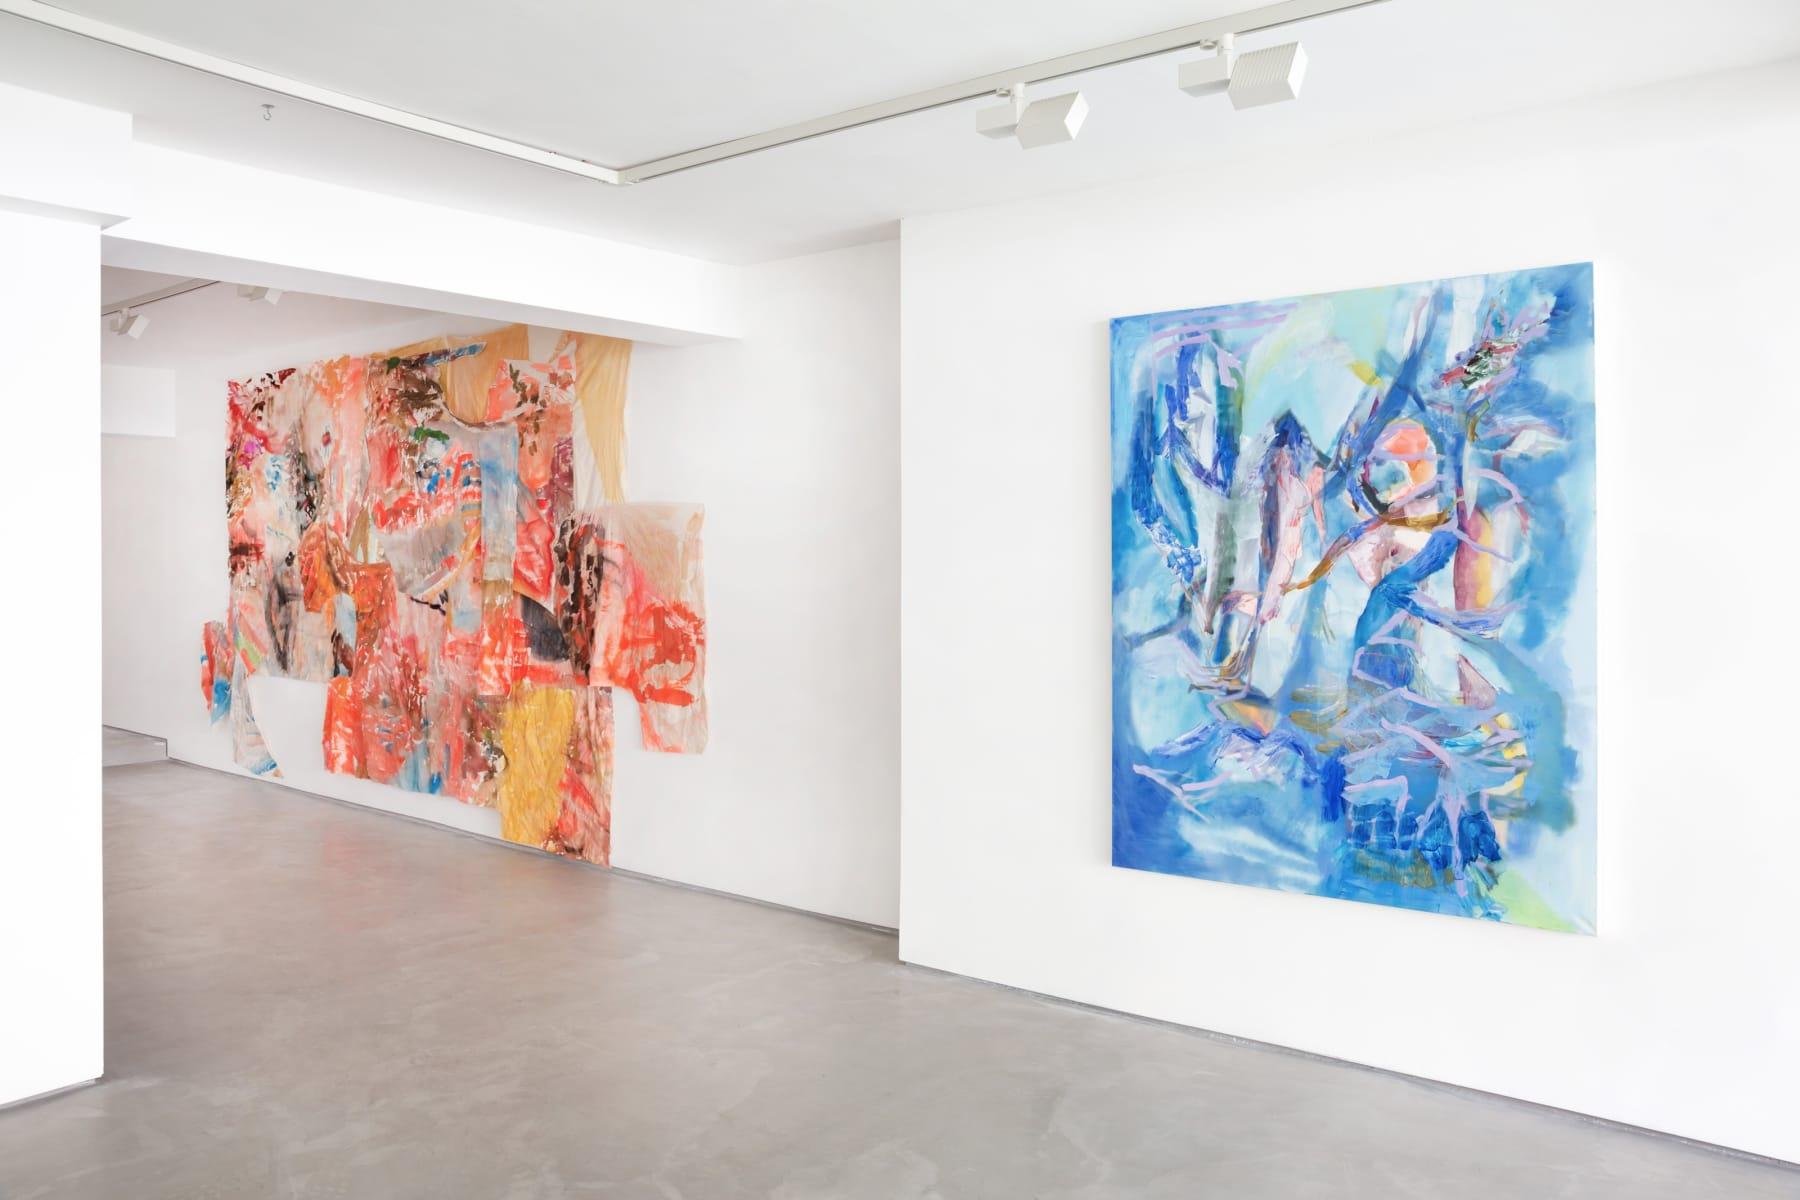 Francesca Mollett, Wild Shade, Informality 2021, installation view